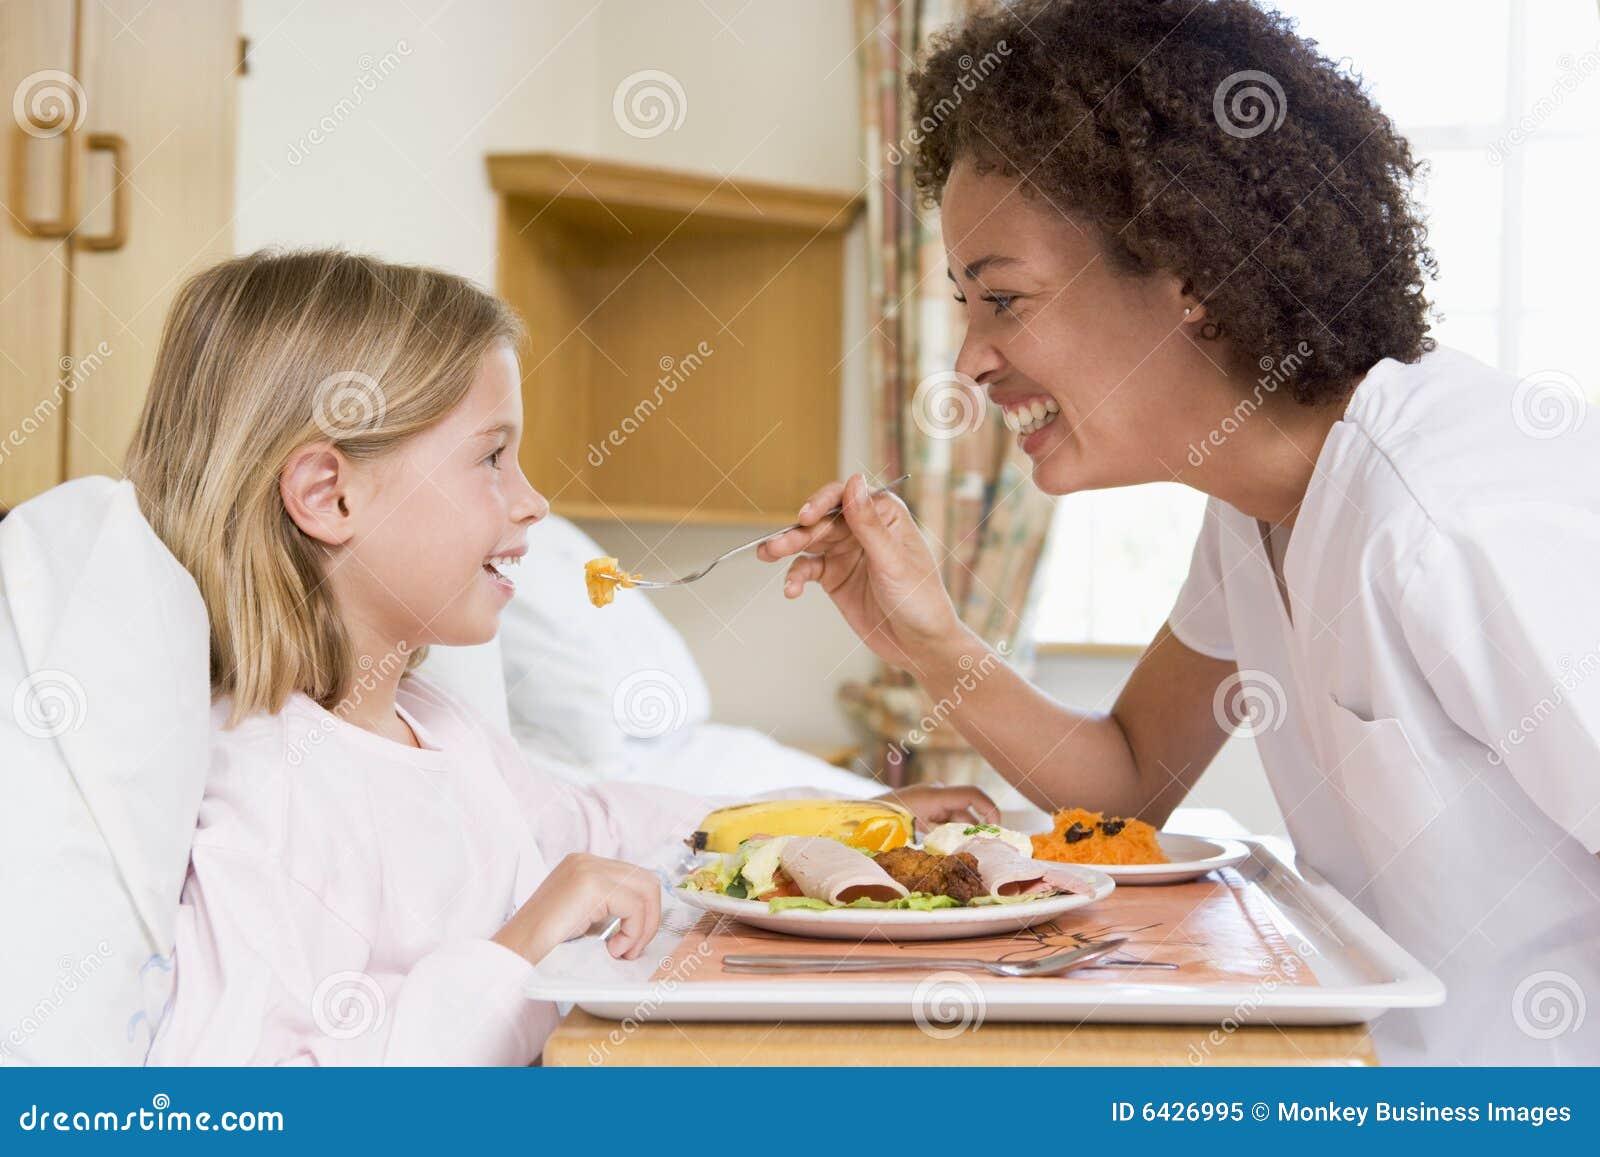 Verpleegster die Jong Meisje voedt